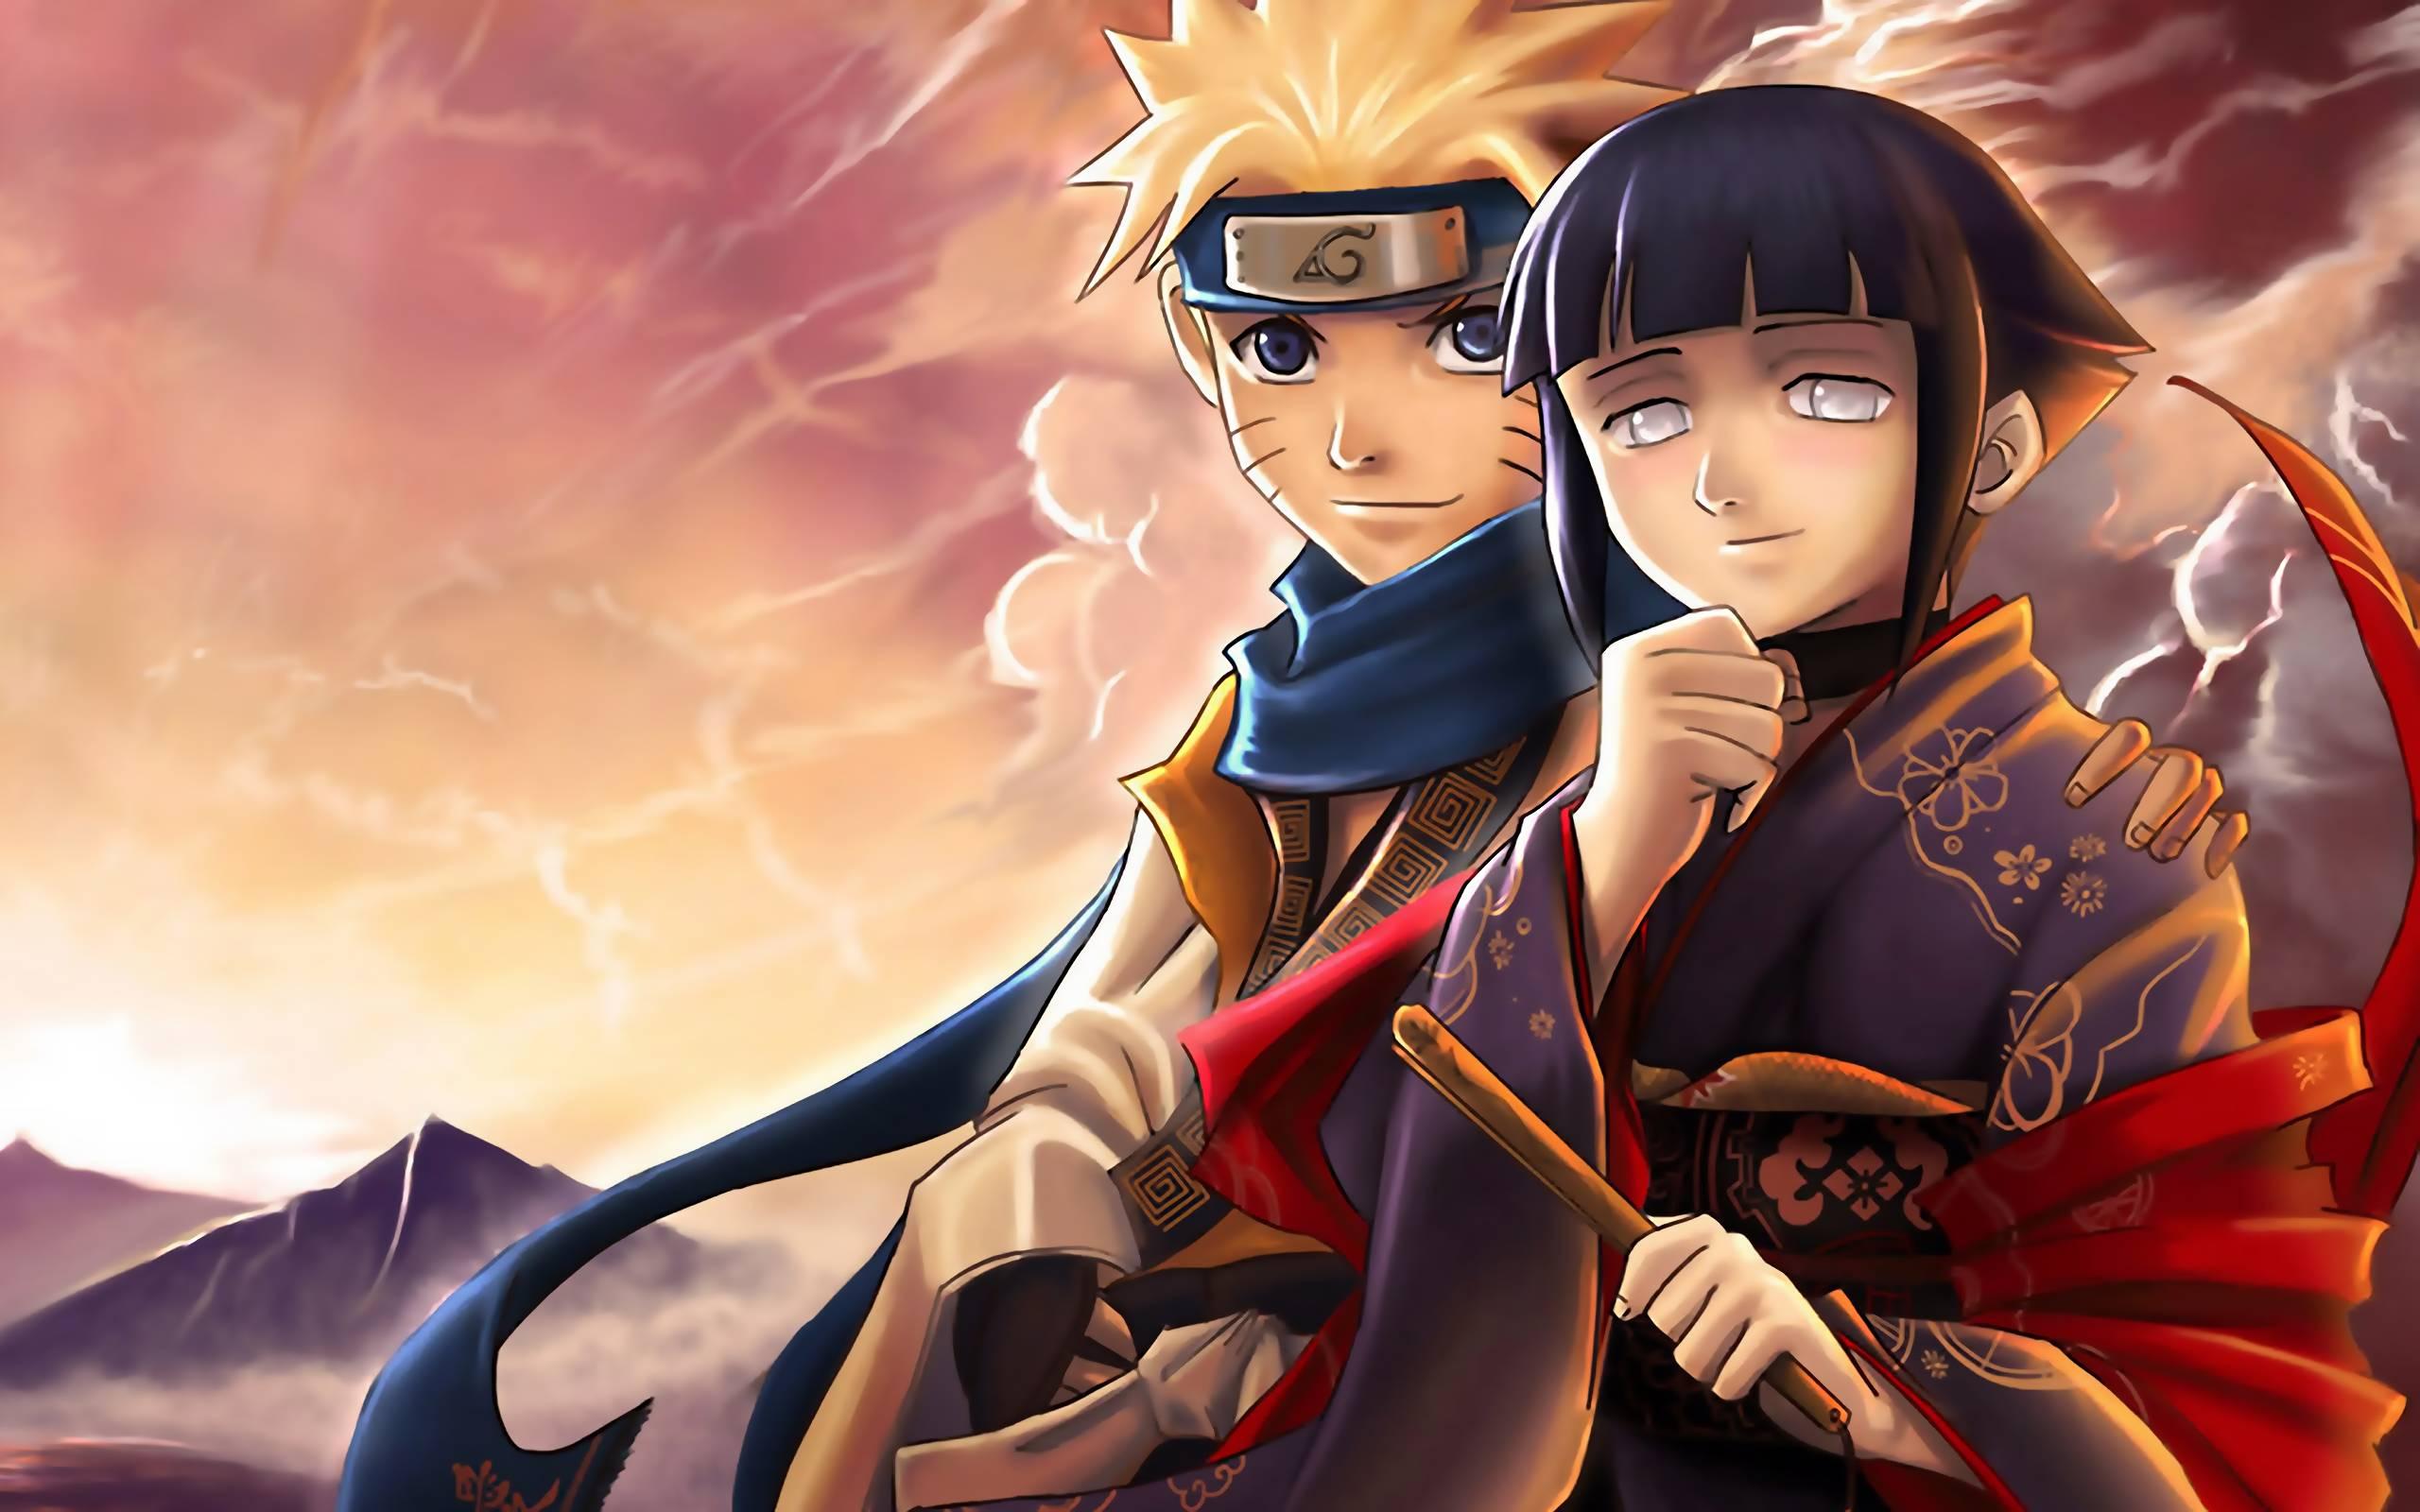 Hinata with Naruto Naruto Wallpaper 2560x1600